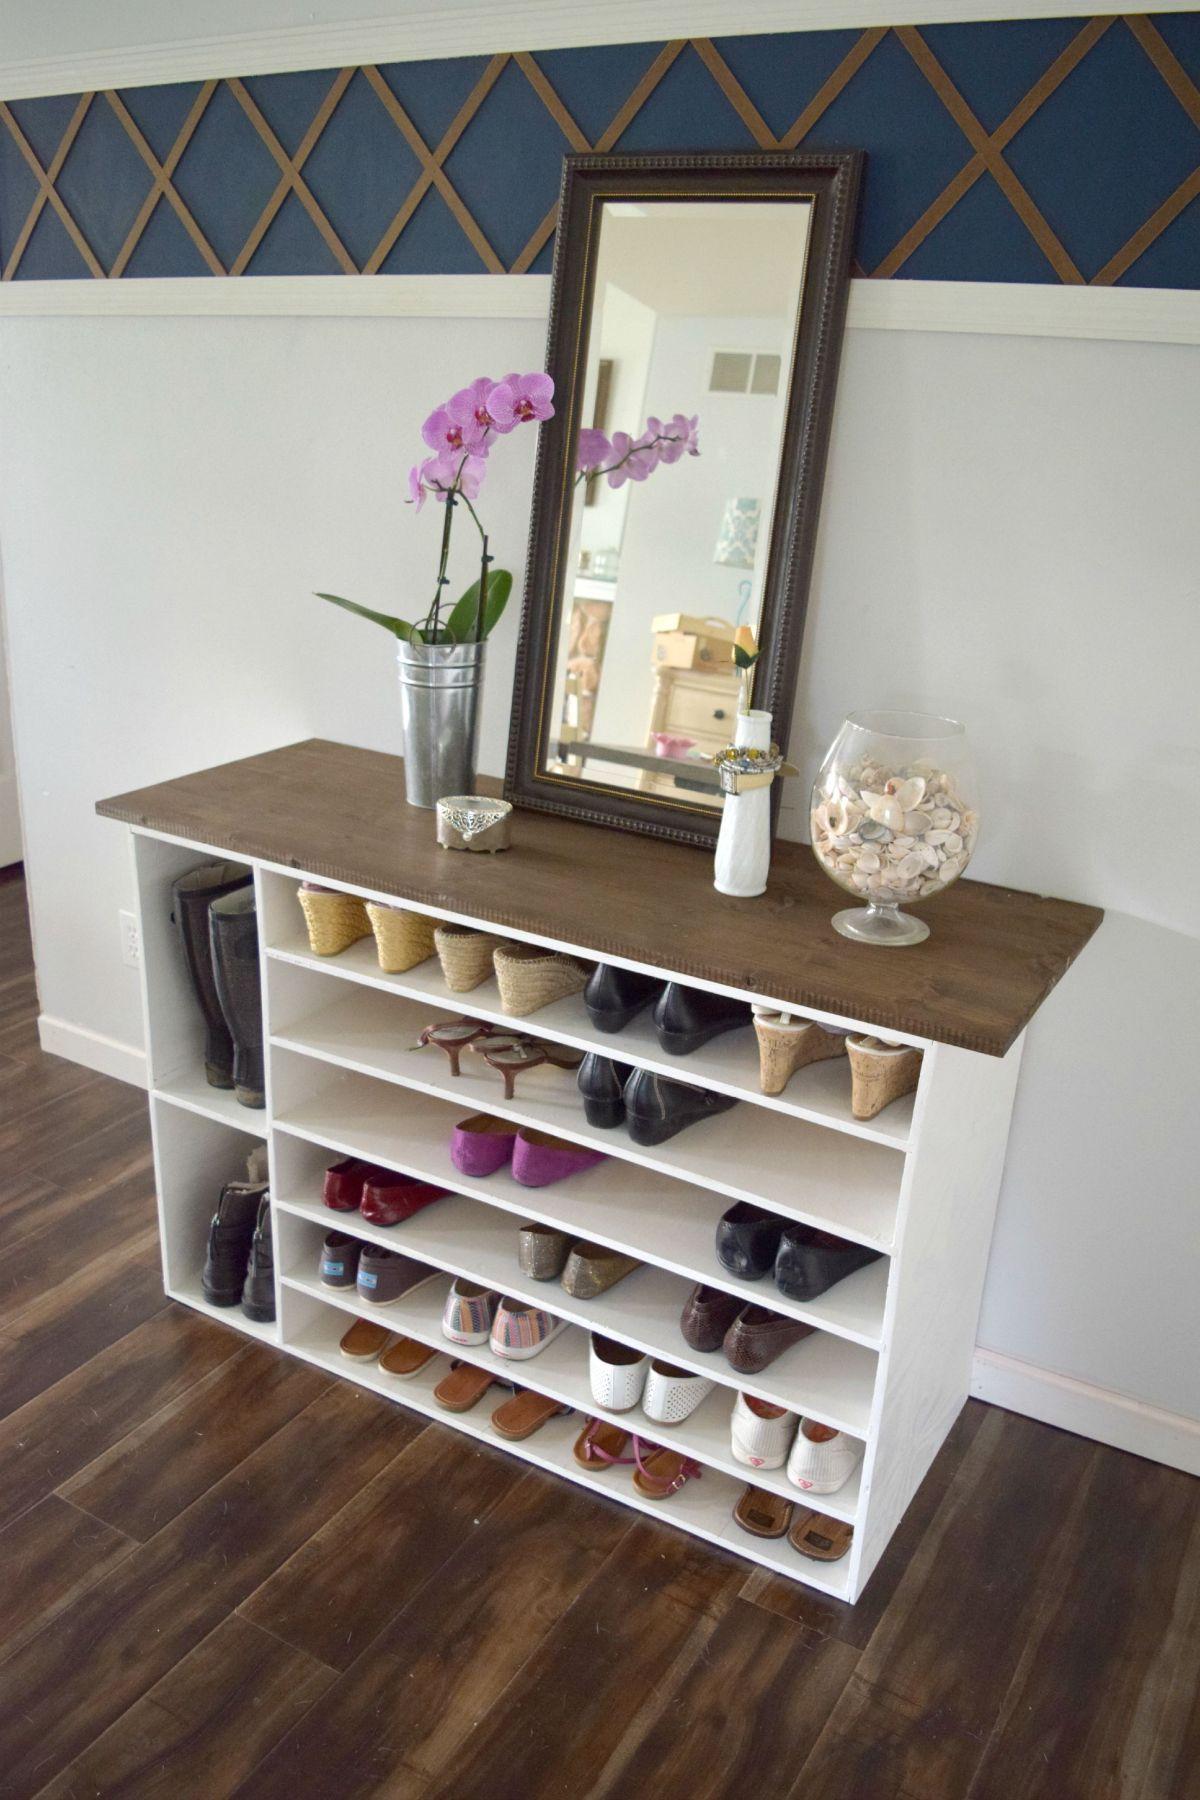 Stylish Diy Shoe Rack Perfect For Any Room Diy Shoe Storage Diy